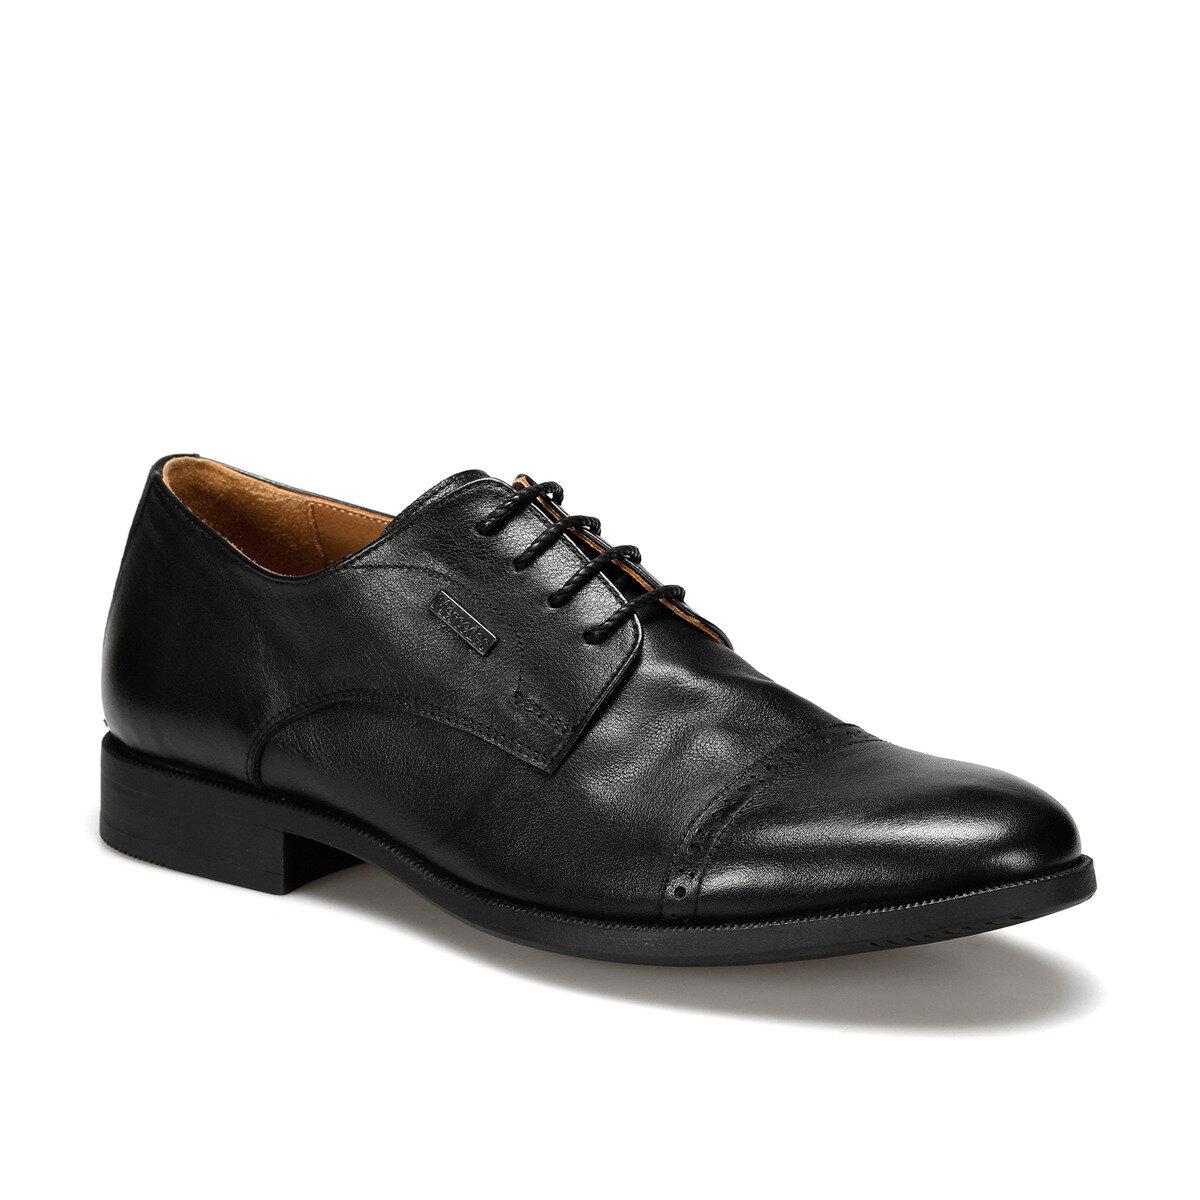 FLO CALI Black Male Maskaret Shoes MERCEDES